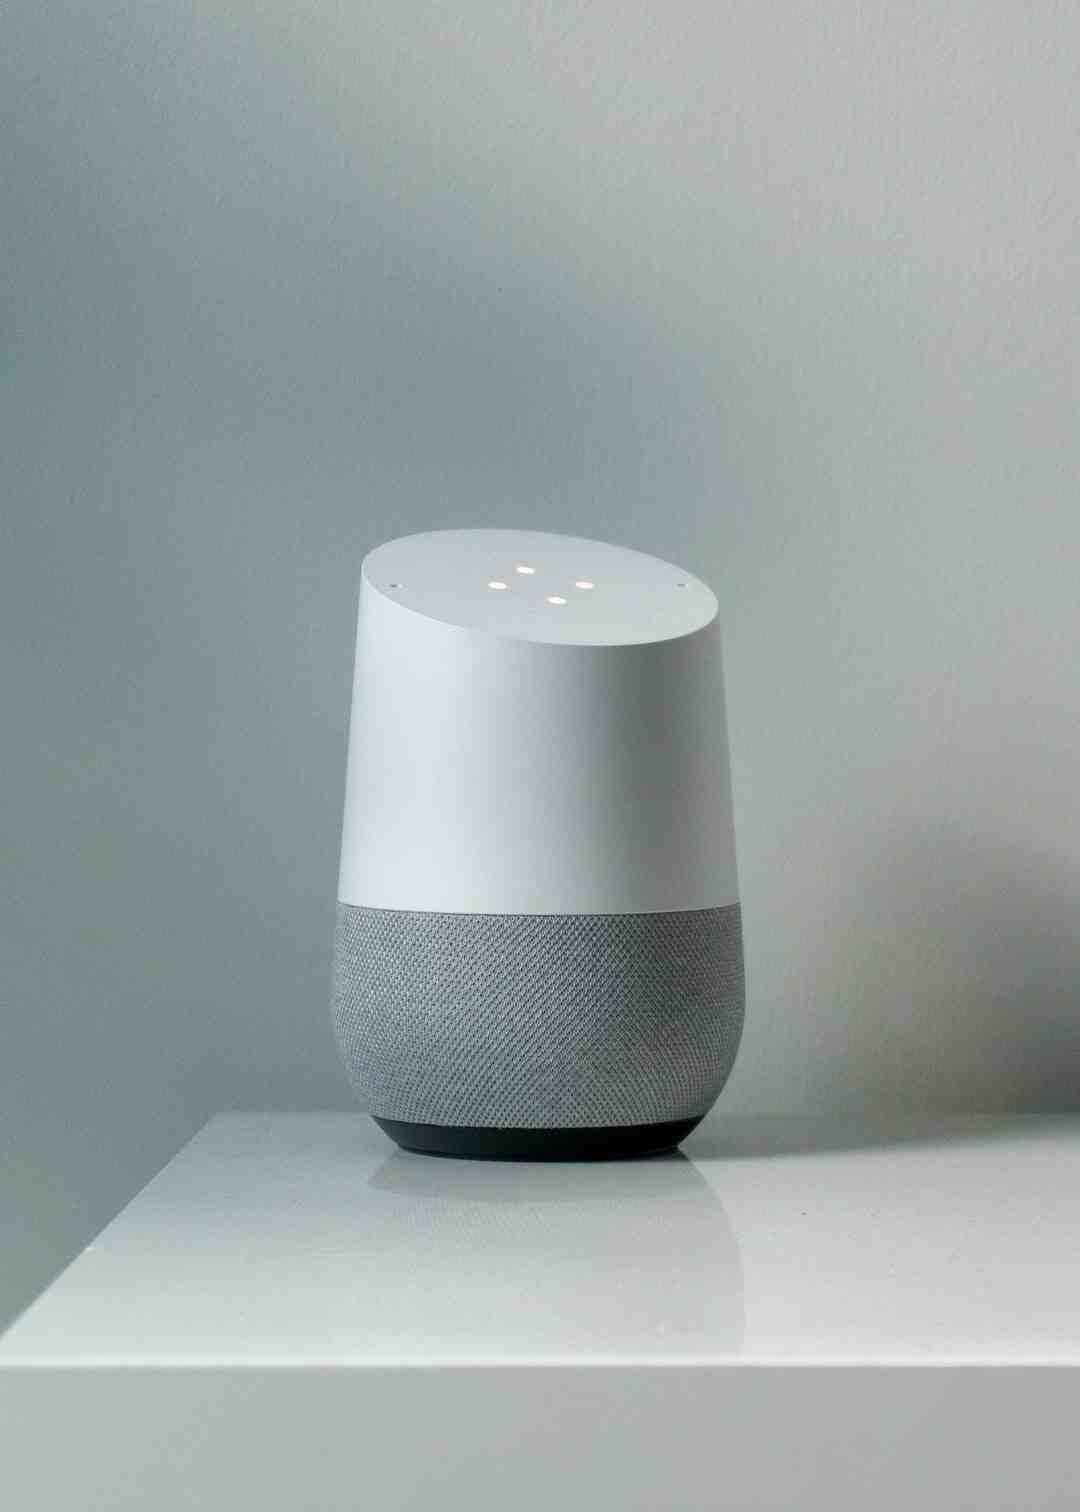 Comment connecter Google Home à son telephone ?